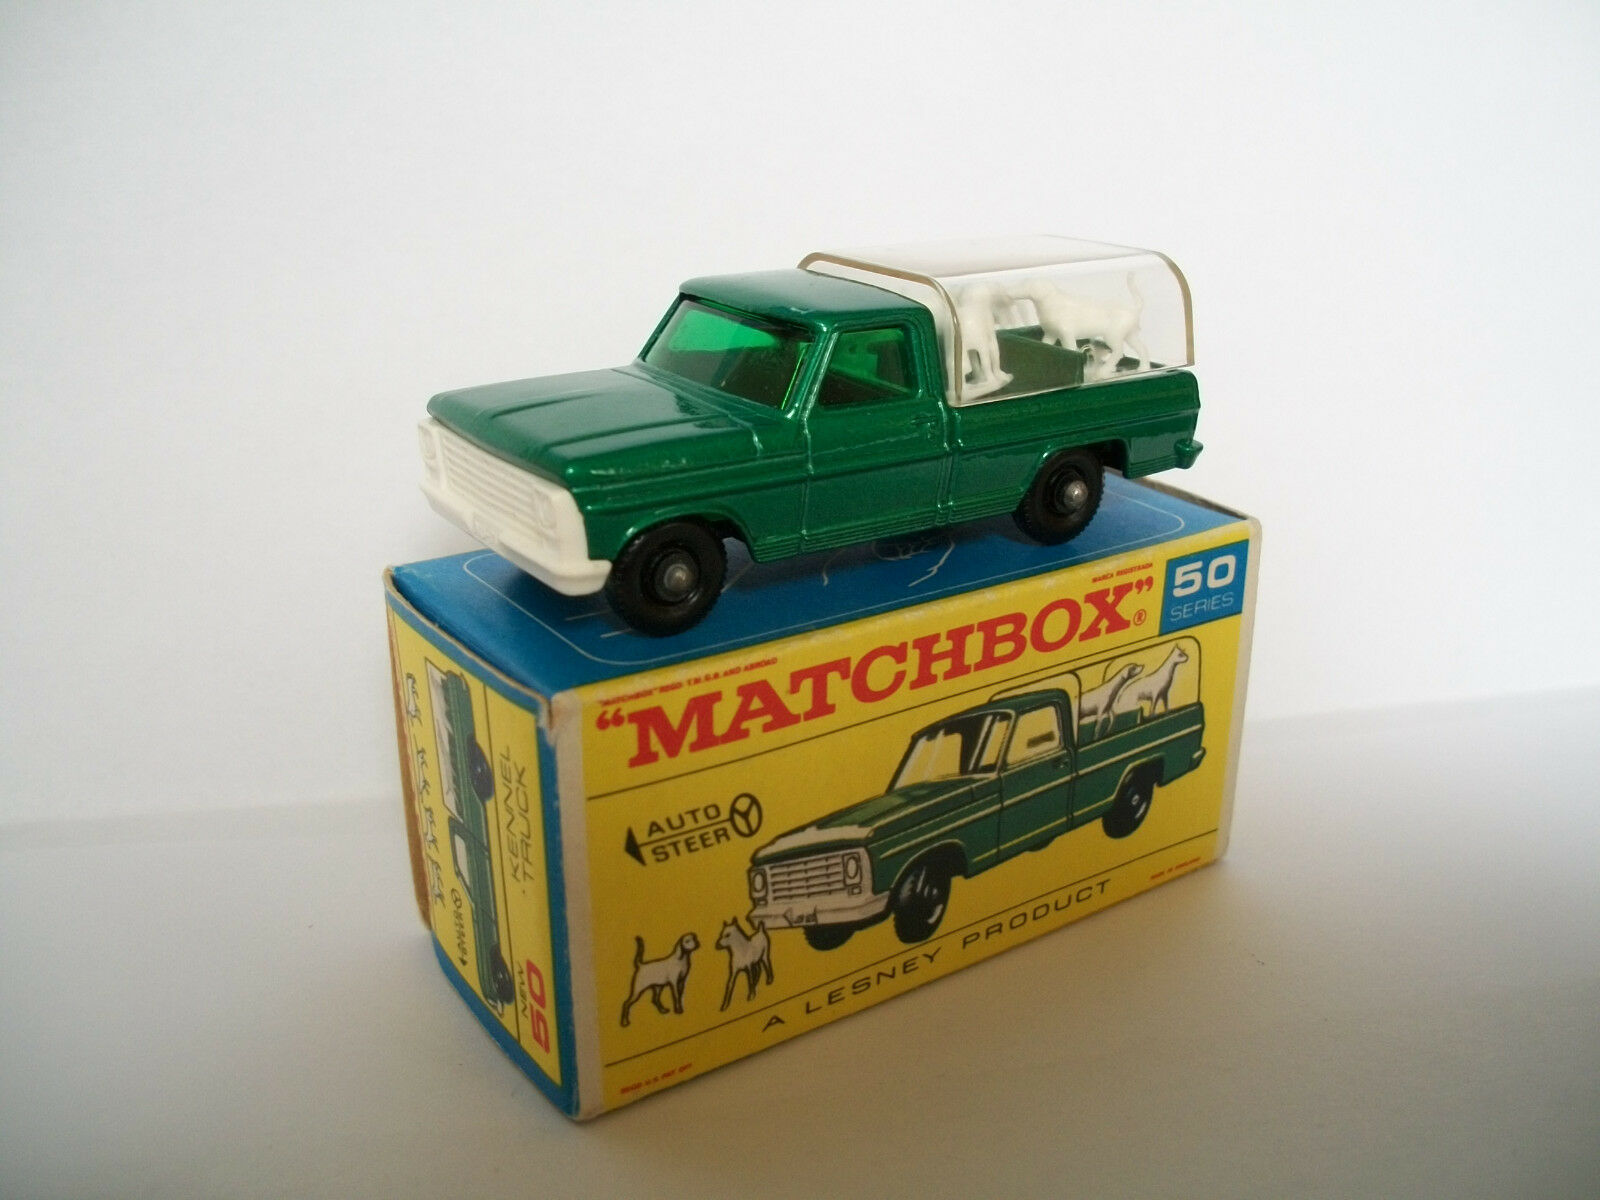 MATCHBOX REGULAR Wheel Nº 50 C FORD petits animaux camion avec NEUF dans sa boîte Comme neuf en boîte